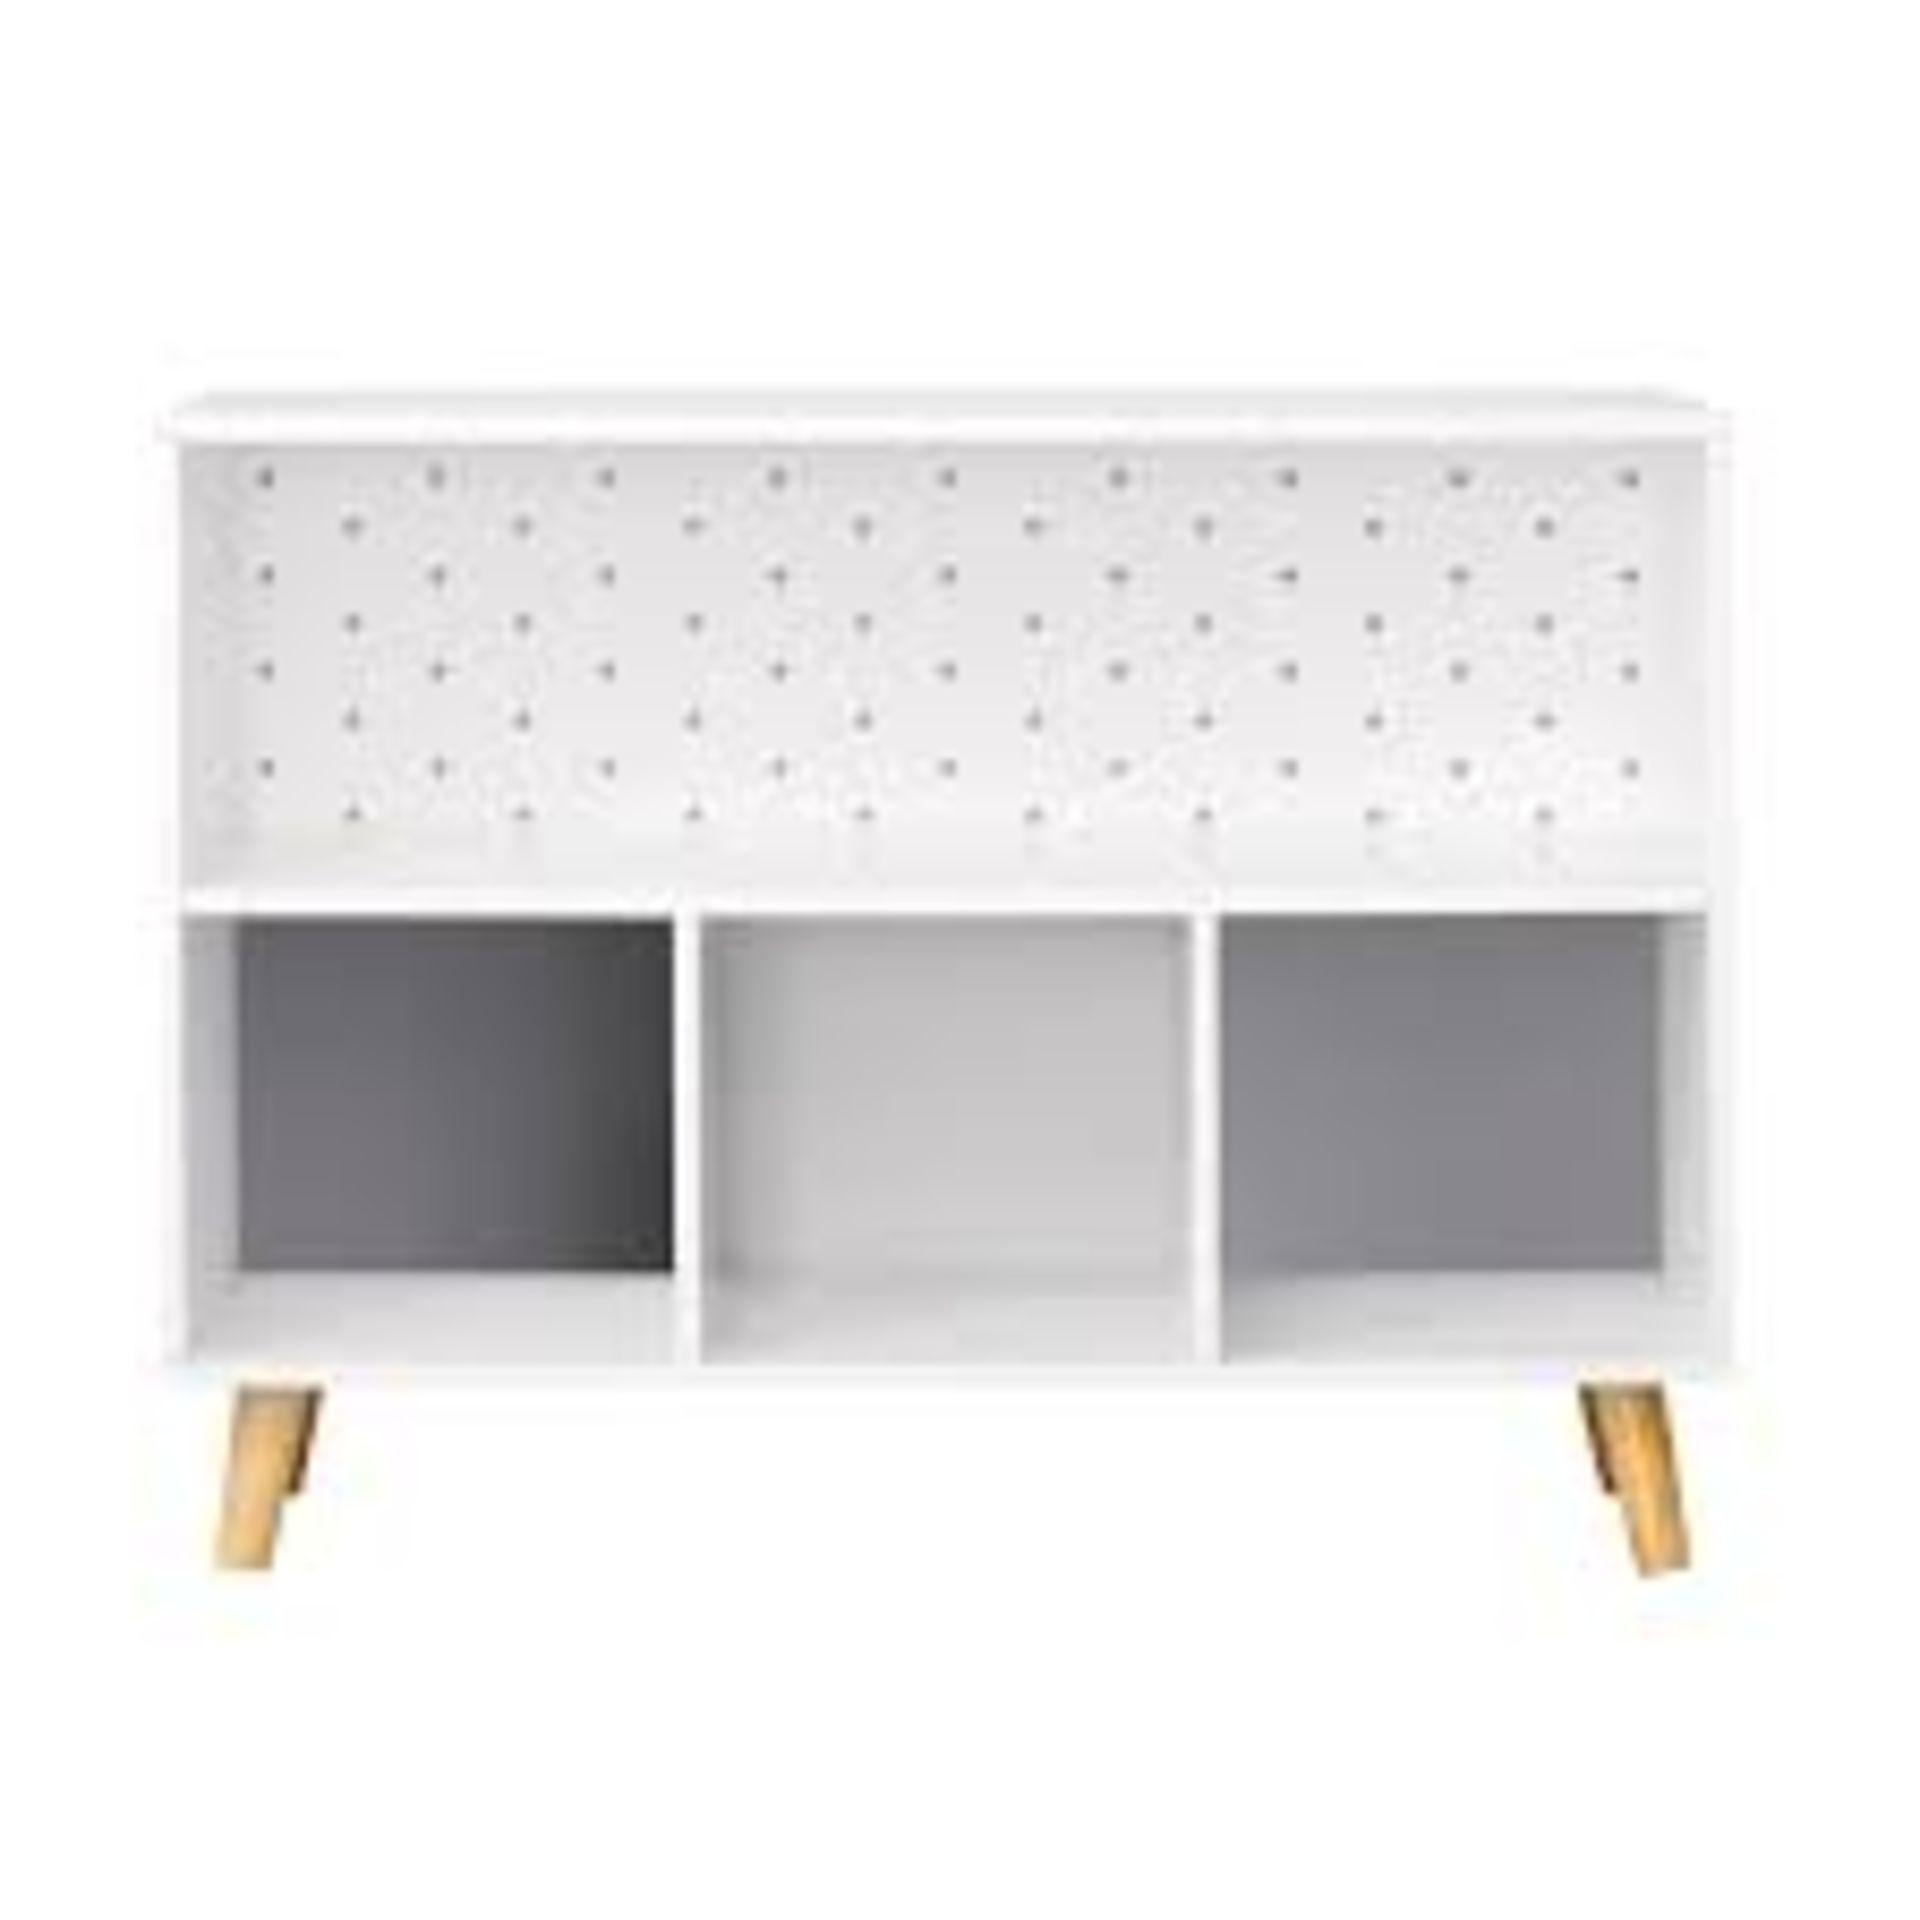 (P3) 1x Flexi Storage Kids Cube Unit With Legs White / Grey. (H580x W780x D280mm) - Image 2 of 3